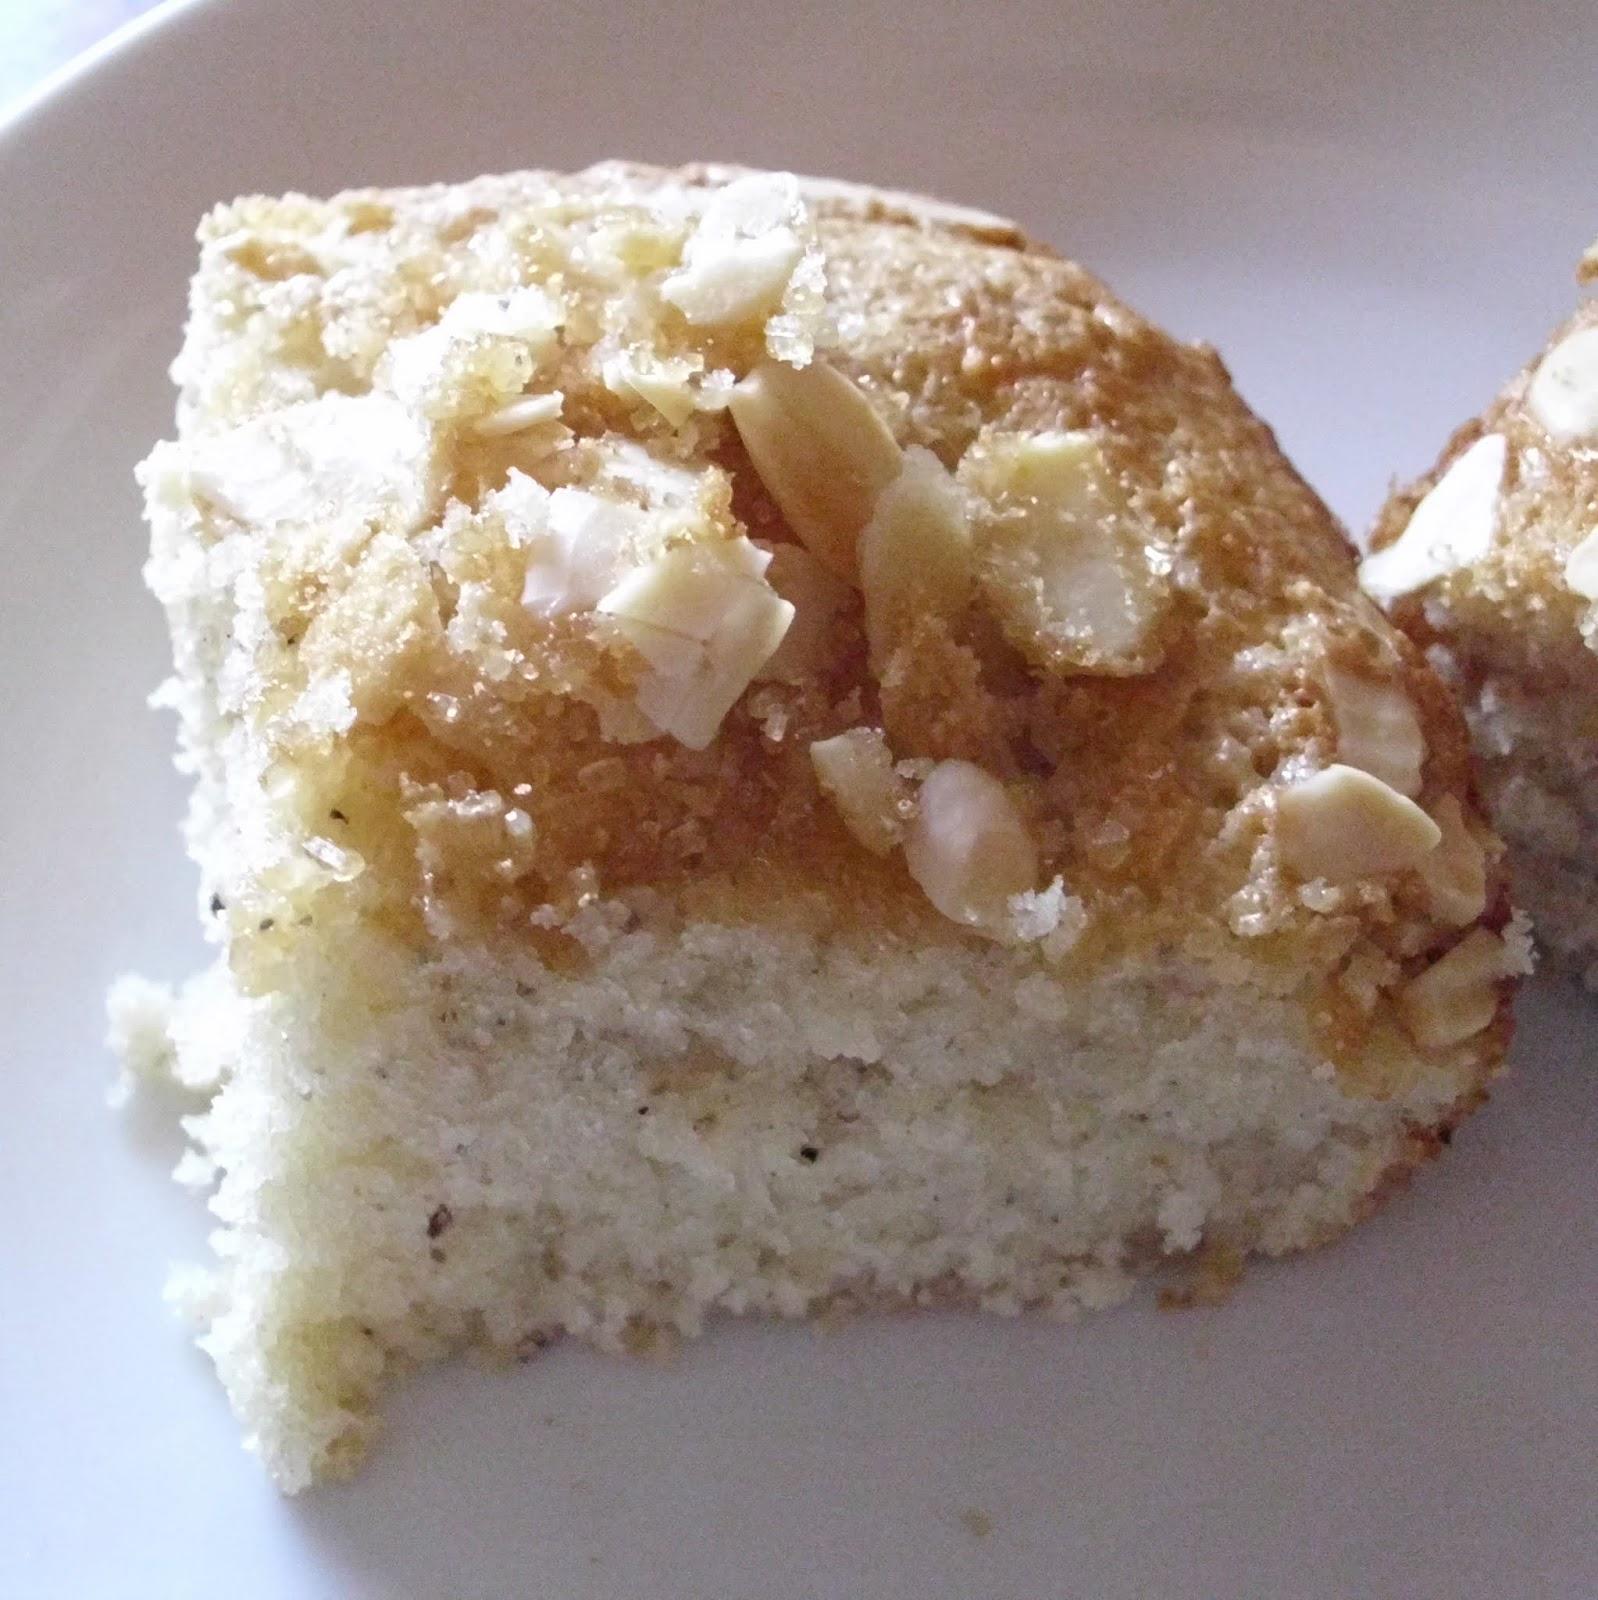 Norwegian Cardamom Coffee Cake